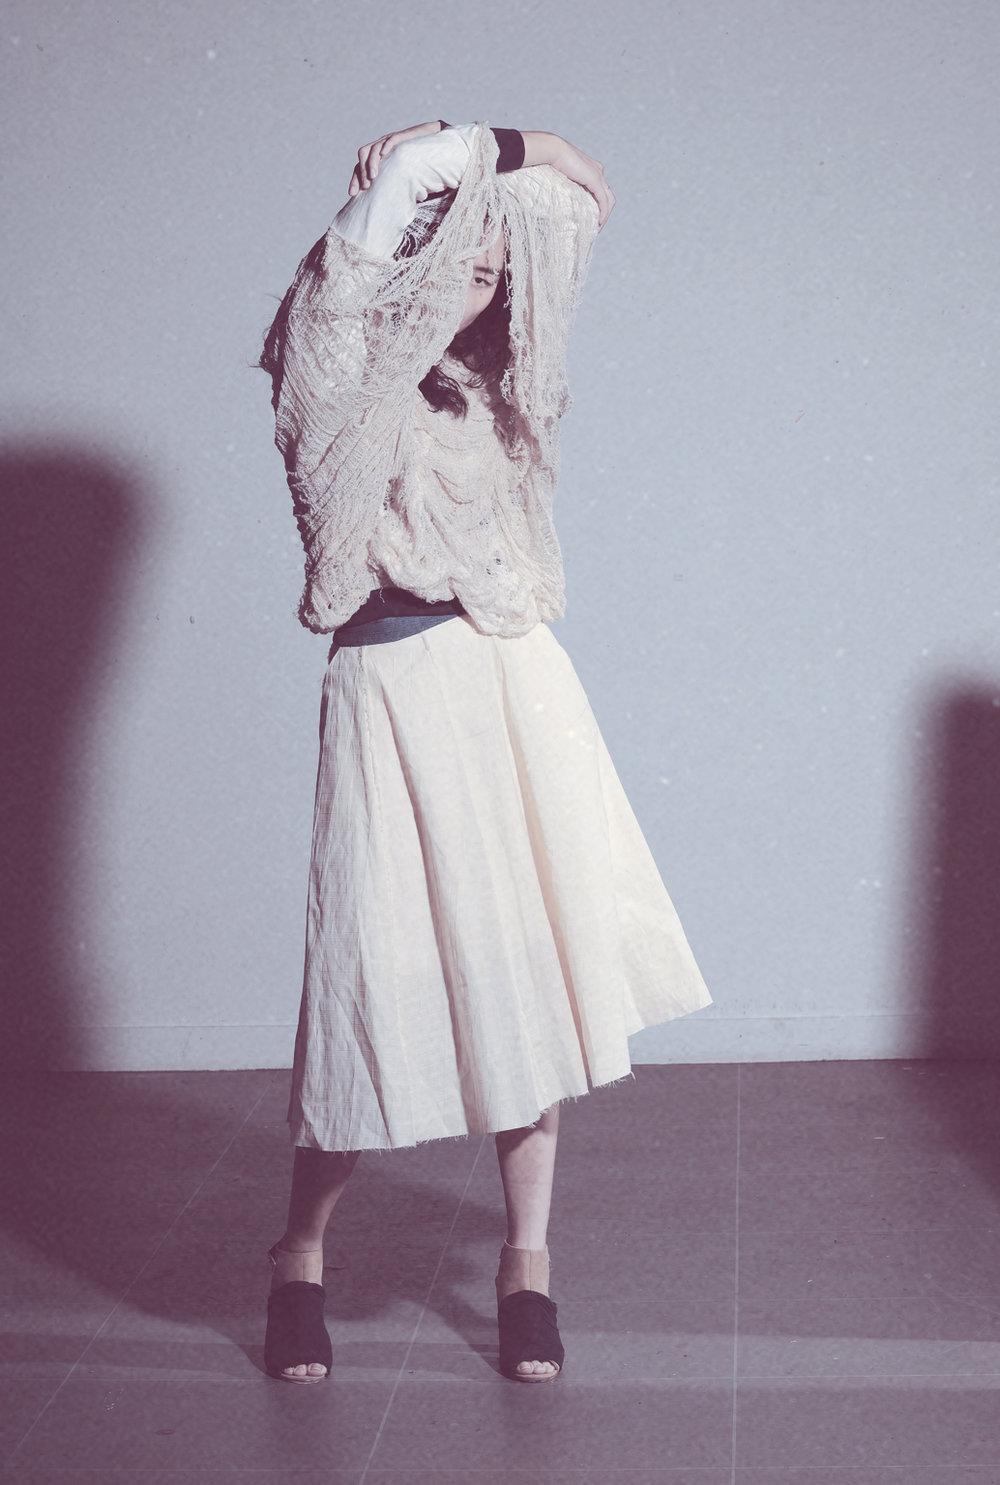 Photo7-Skirt and sweatshirt Unravelau, shoes Kick Footwear.jpg